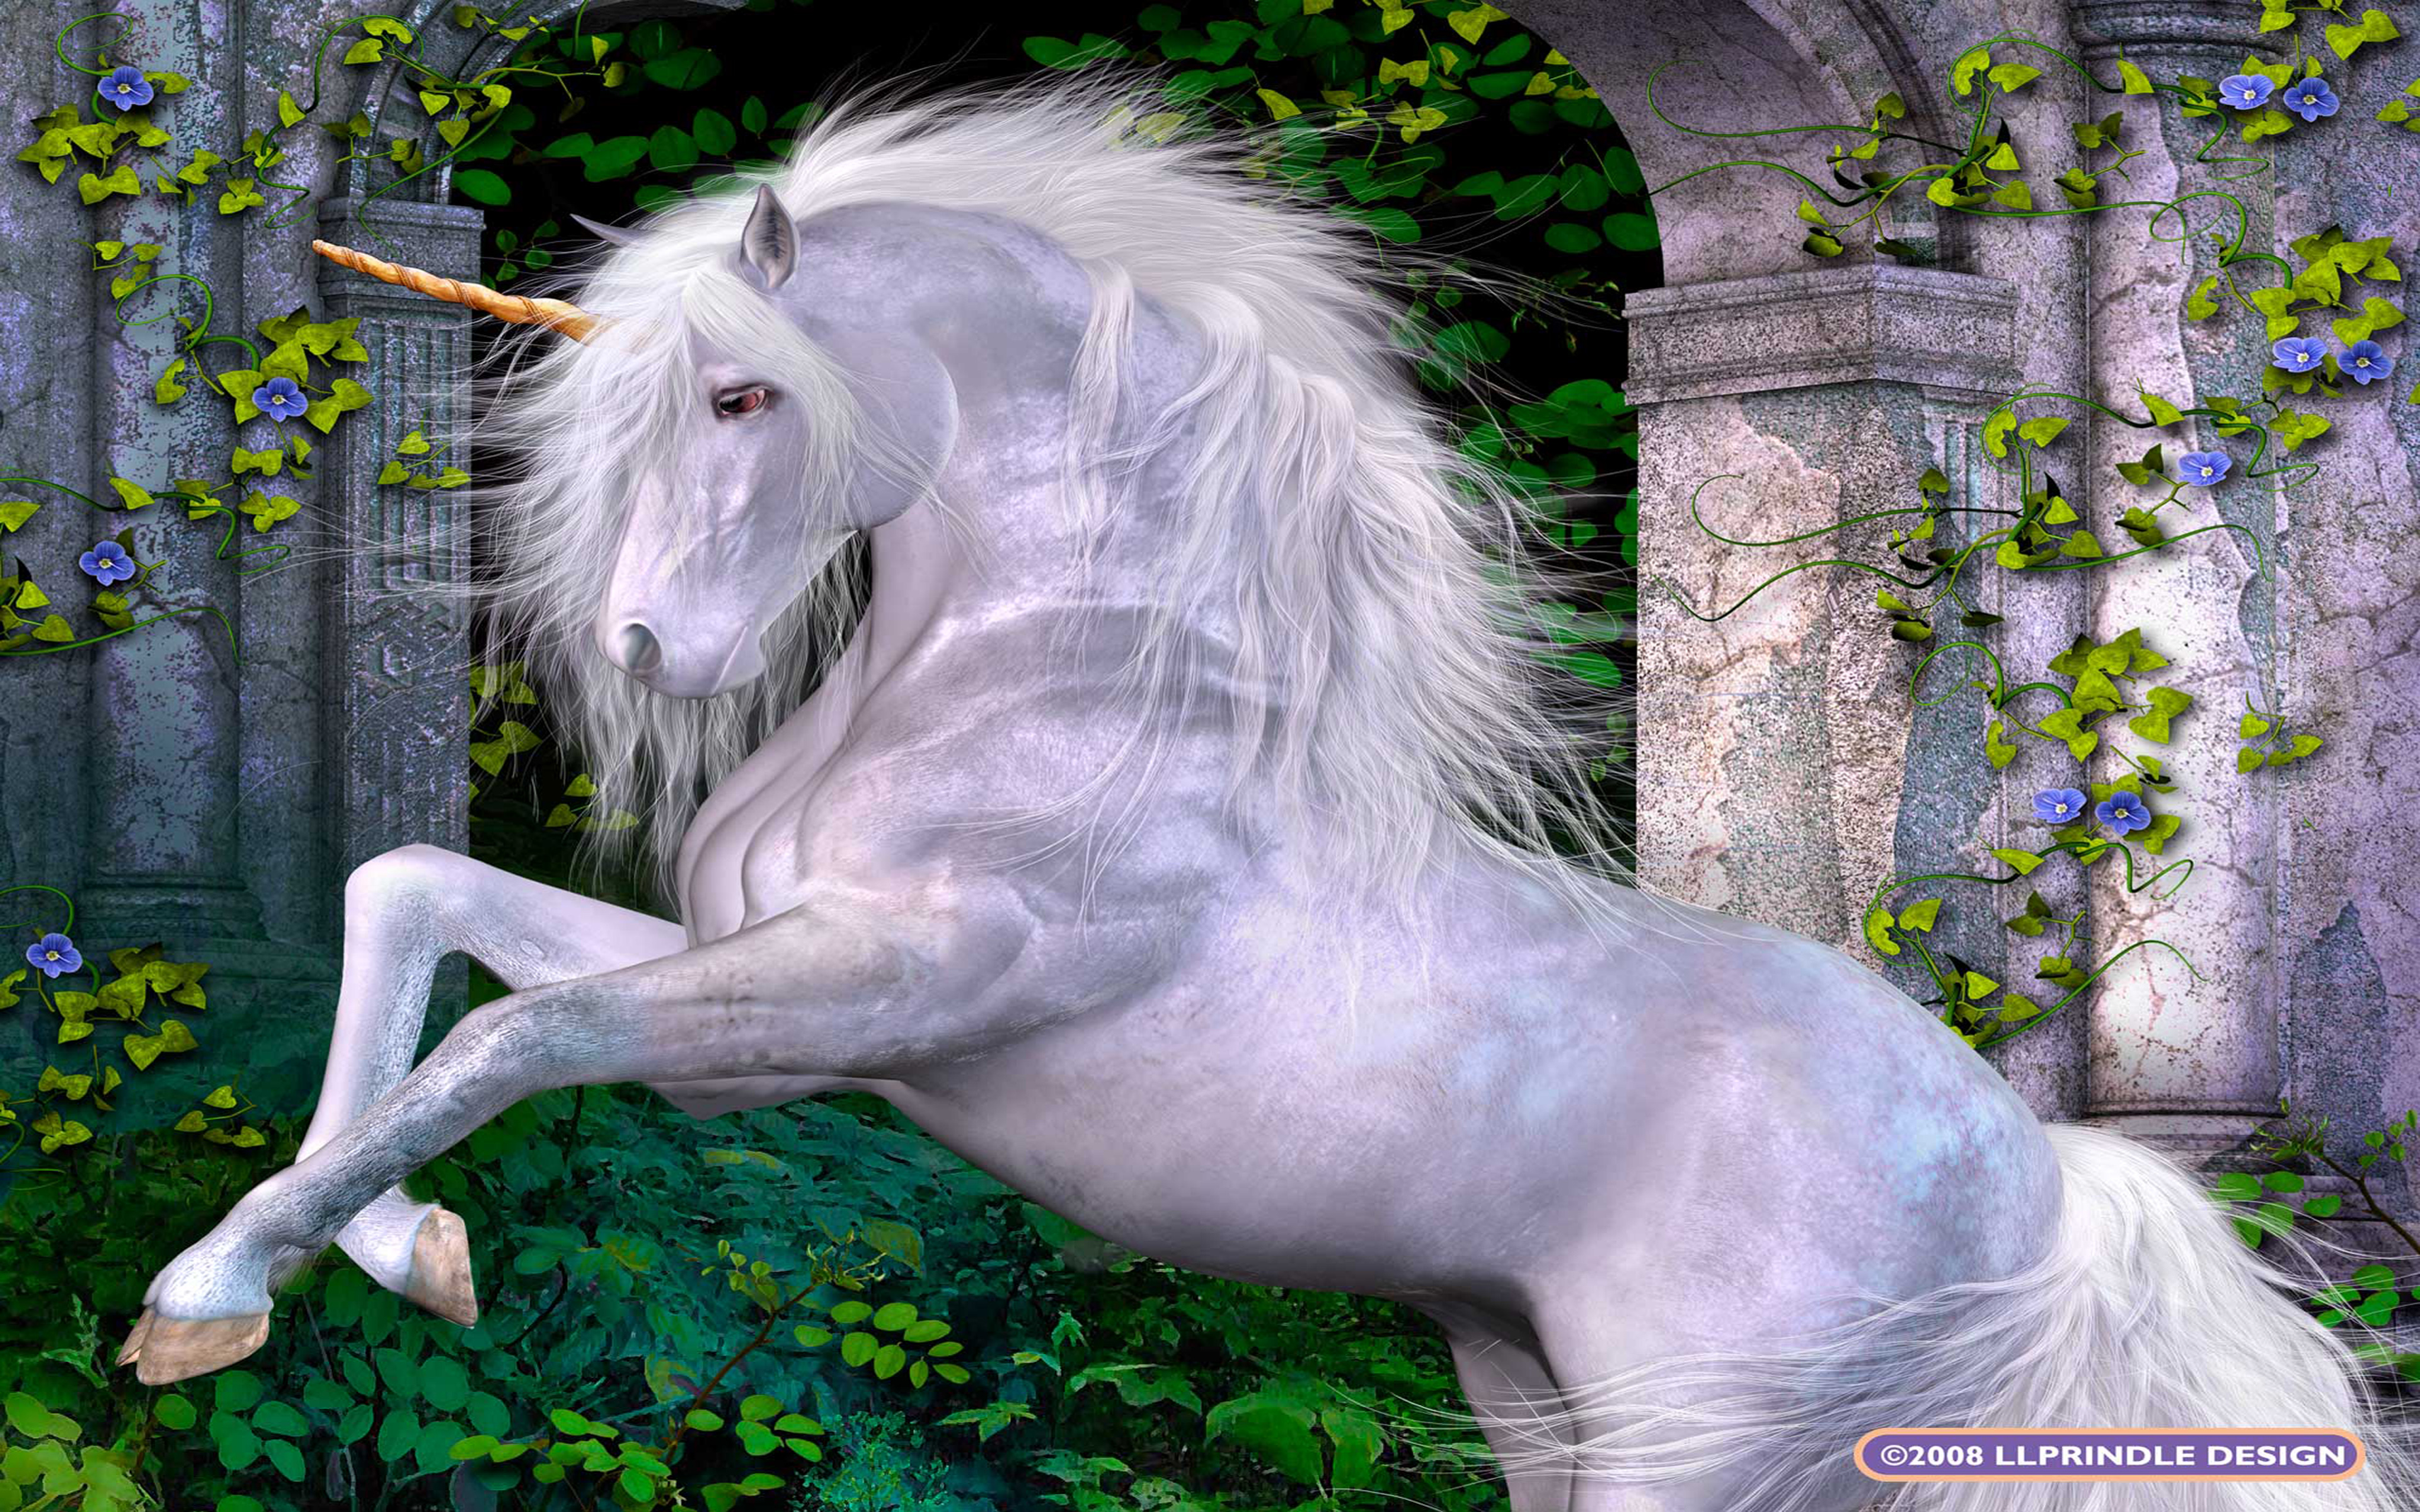 Wallpaper Harry Potter Iphone Silky Unicorn Art Picture Wallpaper Hd Wallpapers13 Com